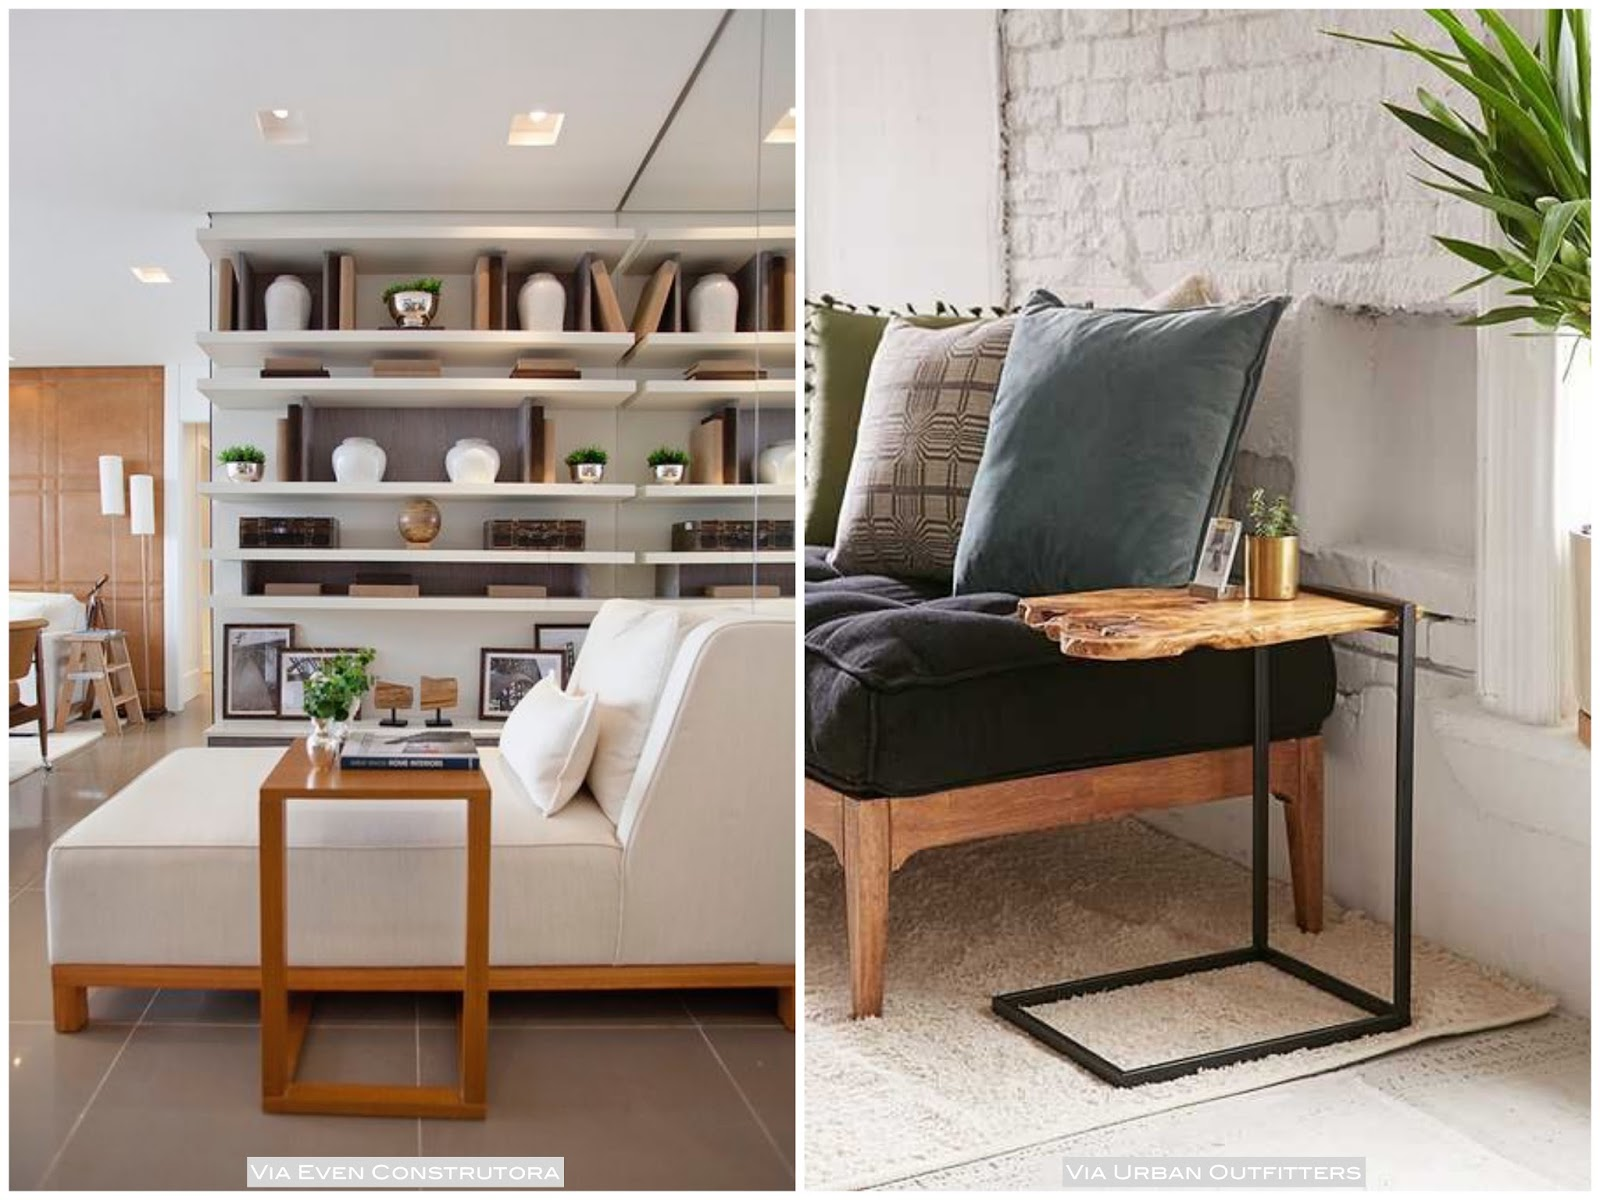 Arquivos Sala De Estar Living Casa Pensada -> Estofados De Canto Confortavel Para Sala Pequena